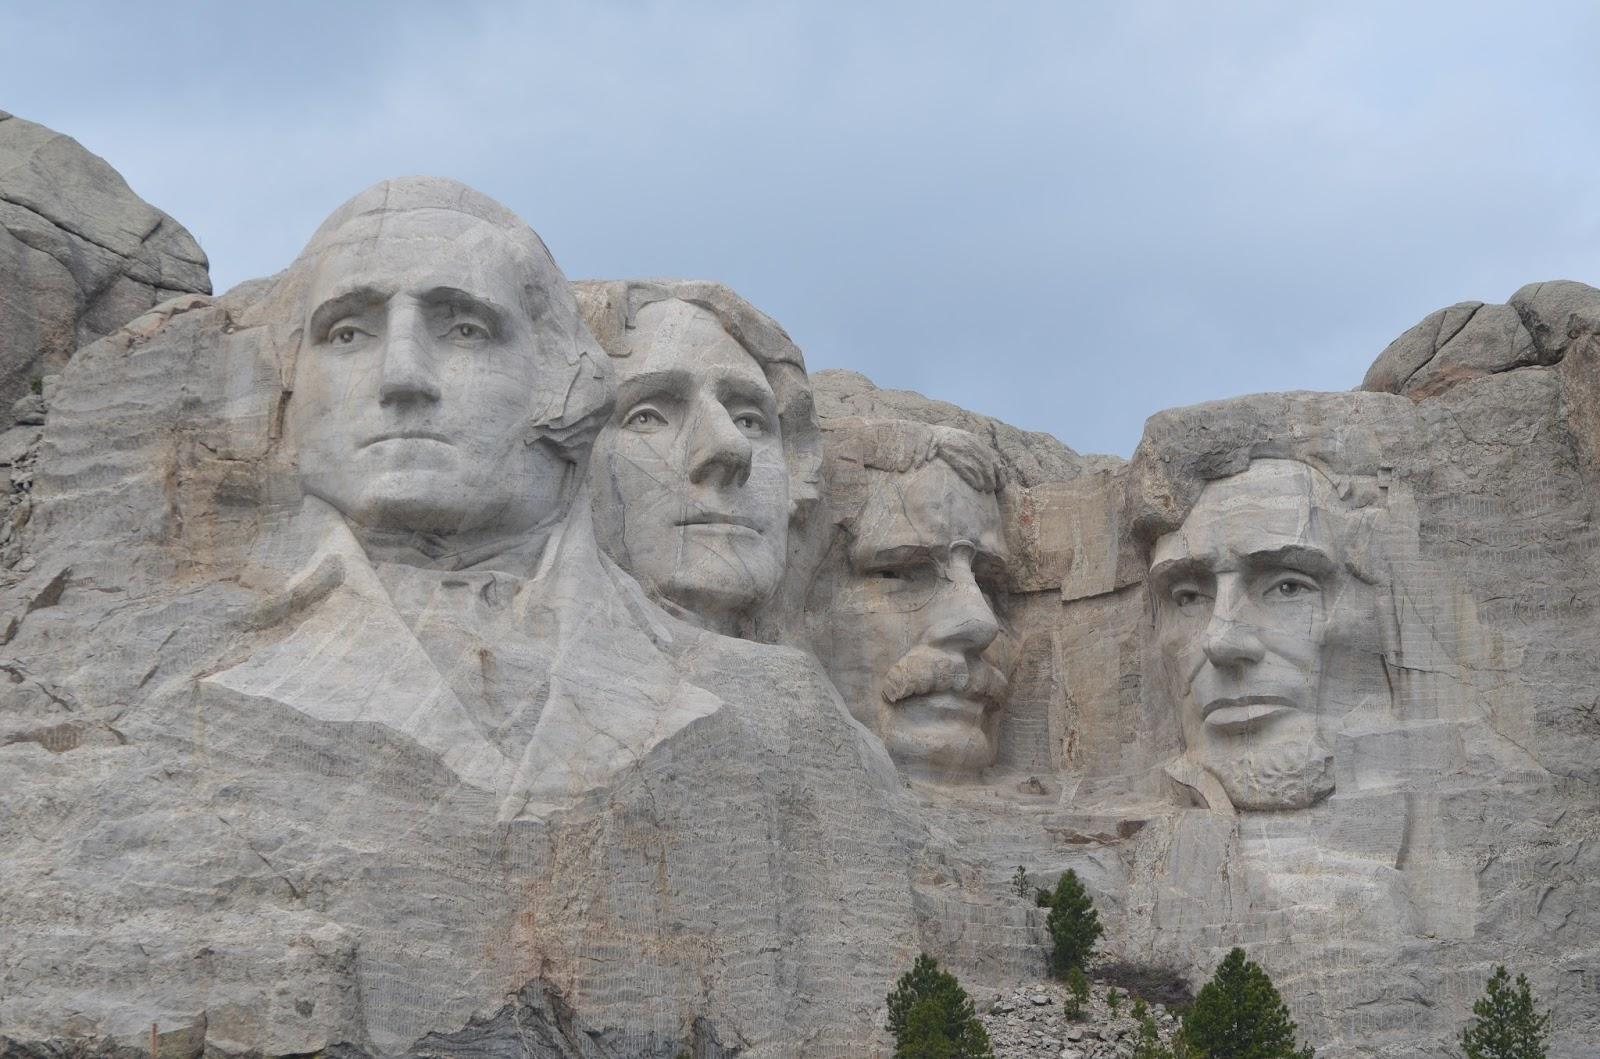 Life Blessings Mount Rushmore